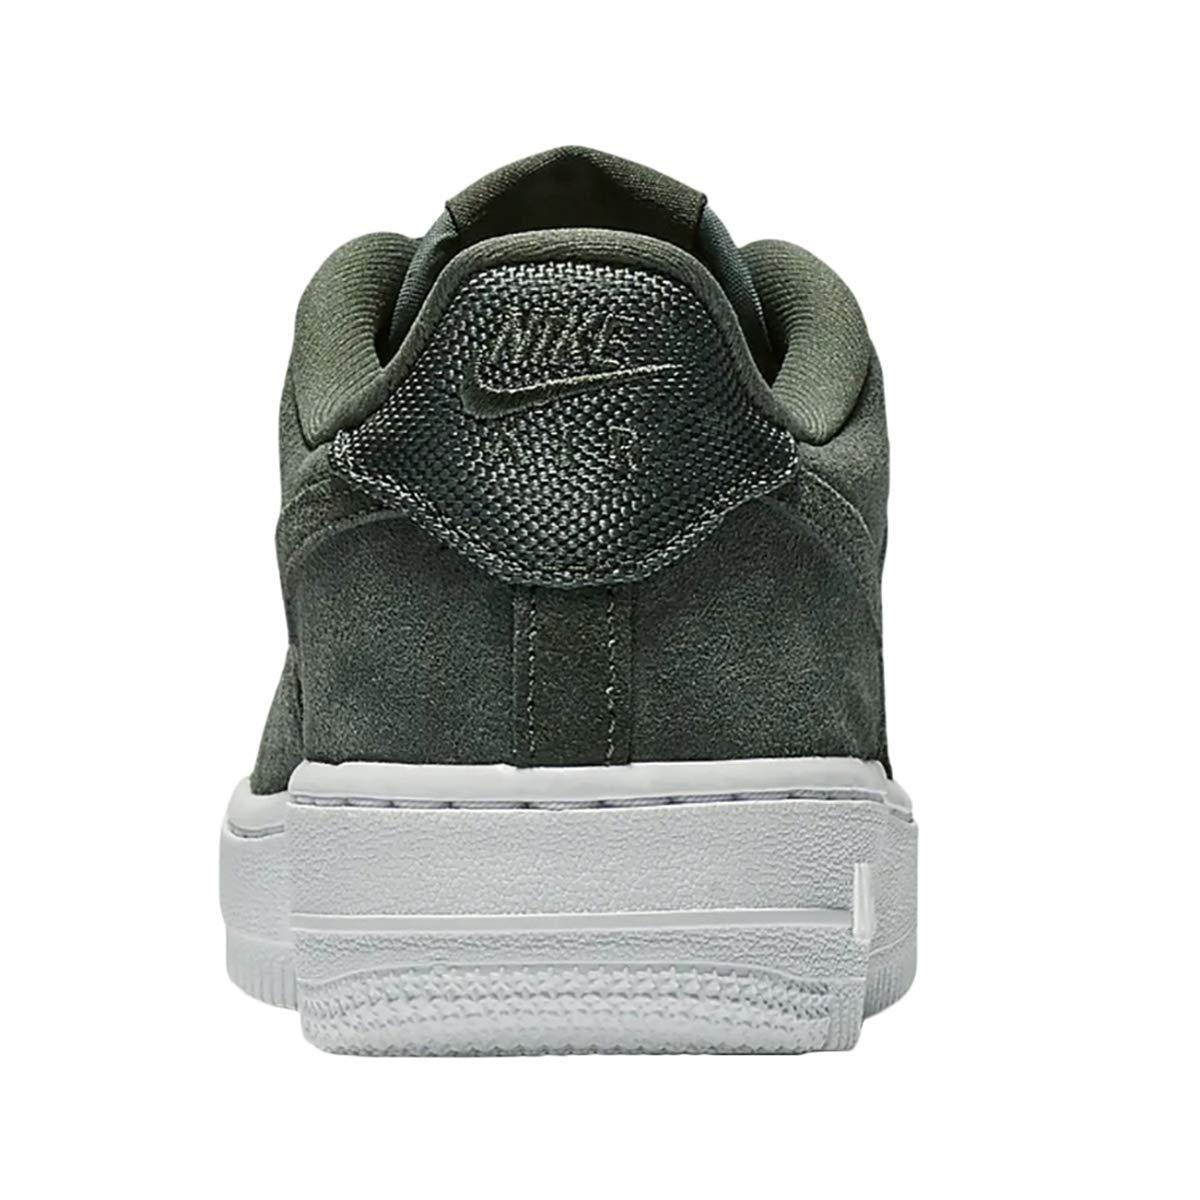 Nike Herren Air Force 1-1 (Gs) Basketballschuhe Basketballschuhe Basketballschuhe 1e81da